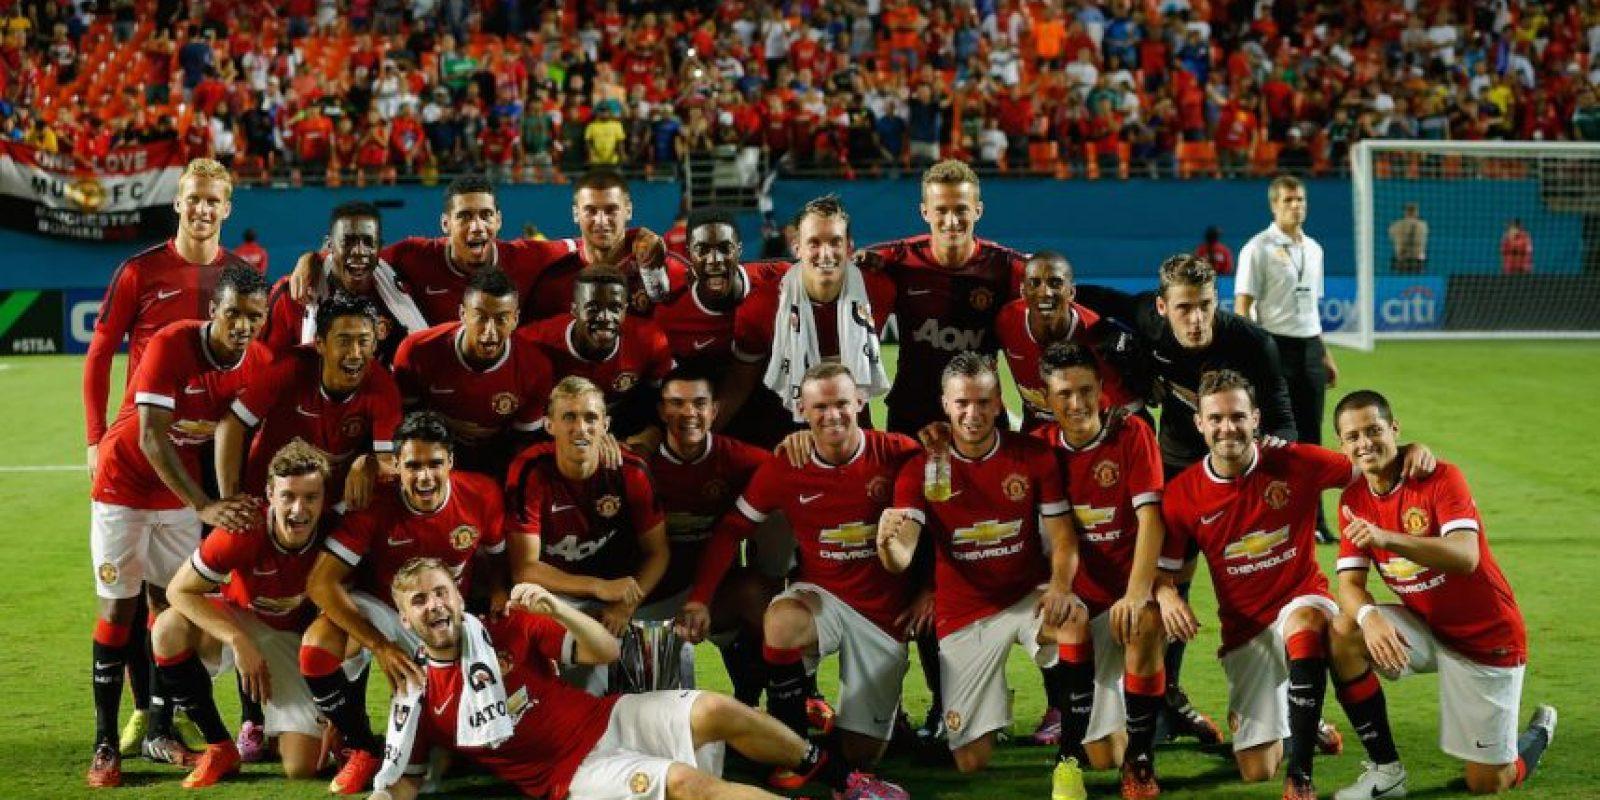 Pero el club inglés escogió a David Moyes y Guardiola se fue a Bayern Munich. Foto:Getty Images